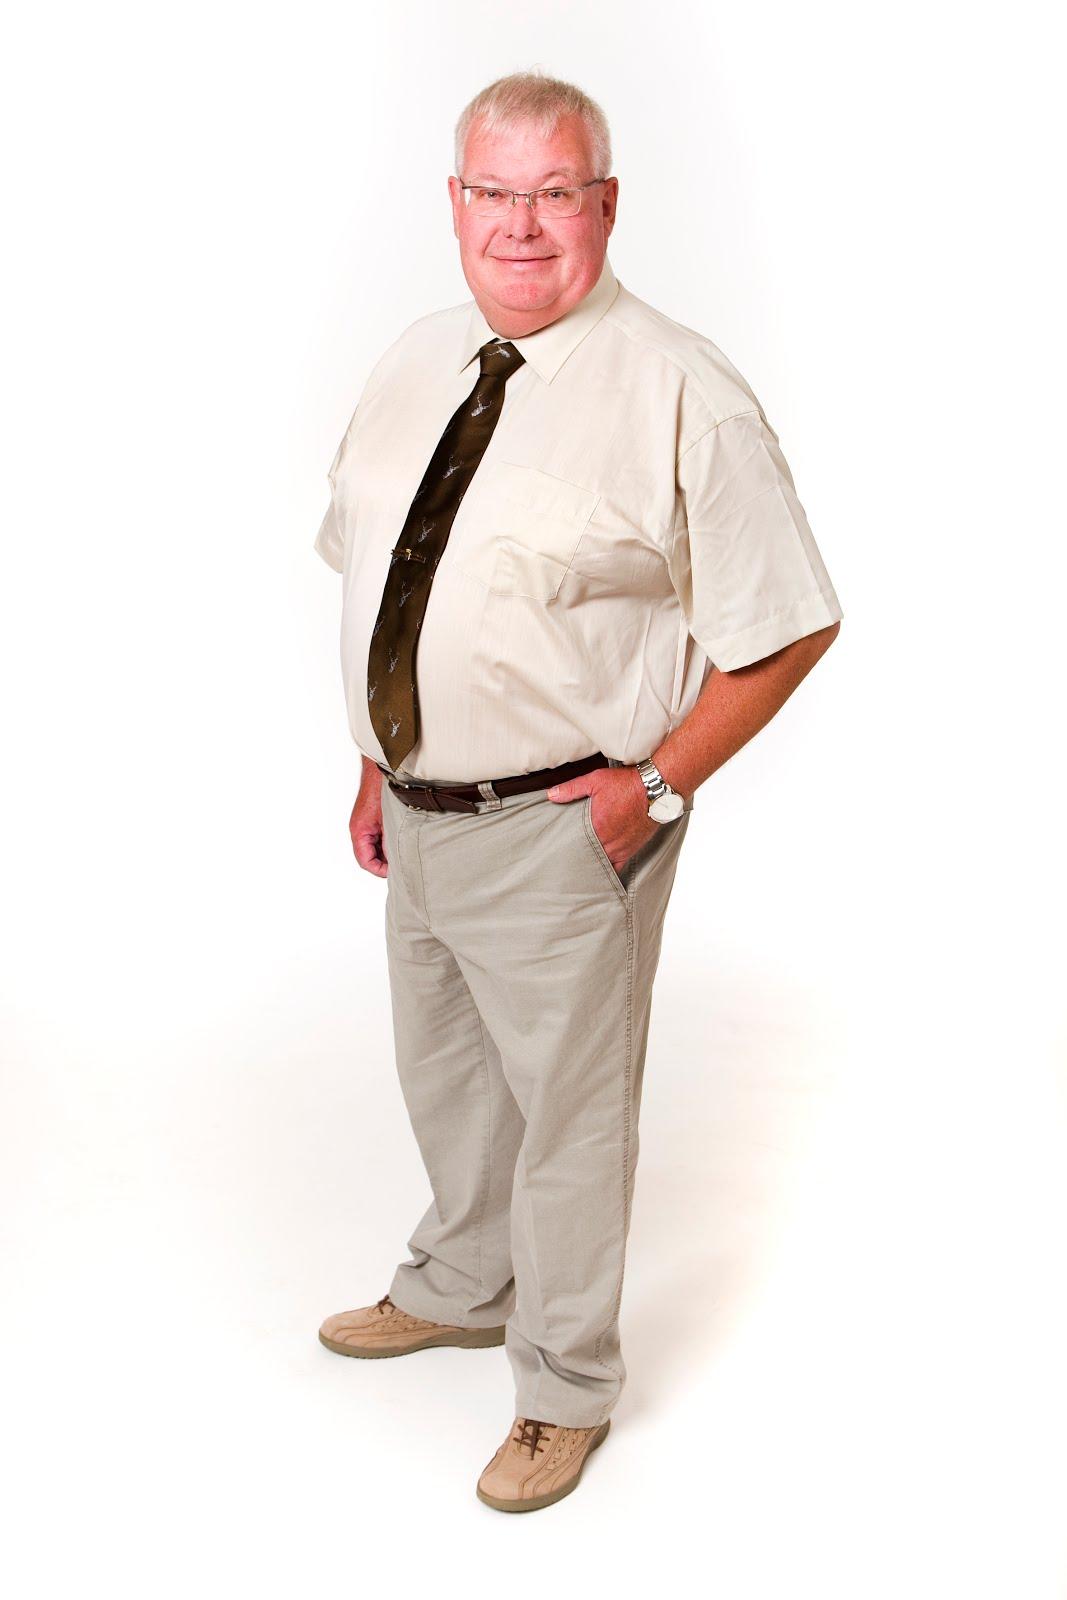 Tomas Peterson (m) - Kommunalråd i Vimmerby